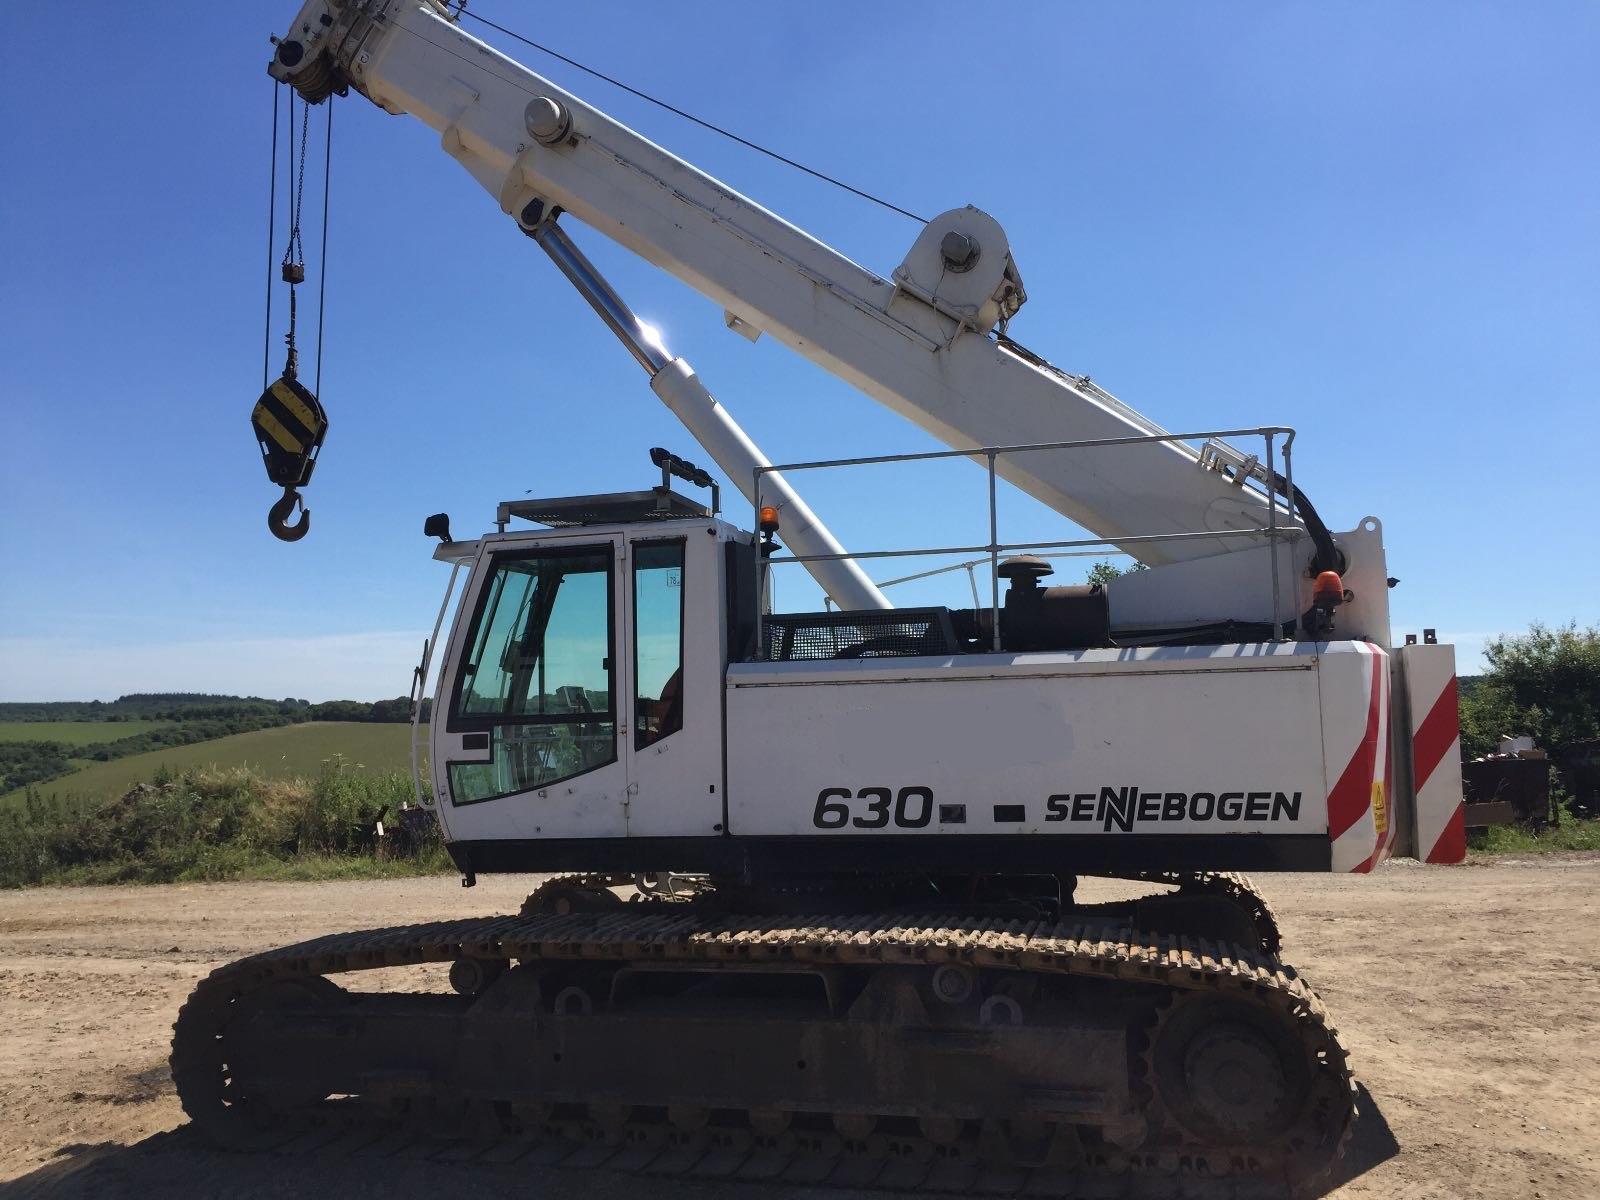 Used Sennebogen 630R 40 tons capacity telescopic crawler crane for sale